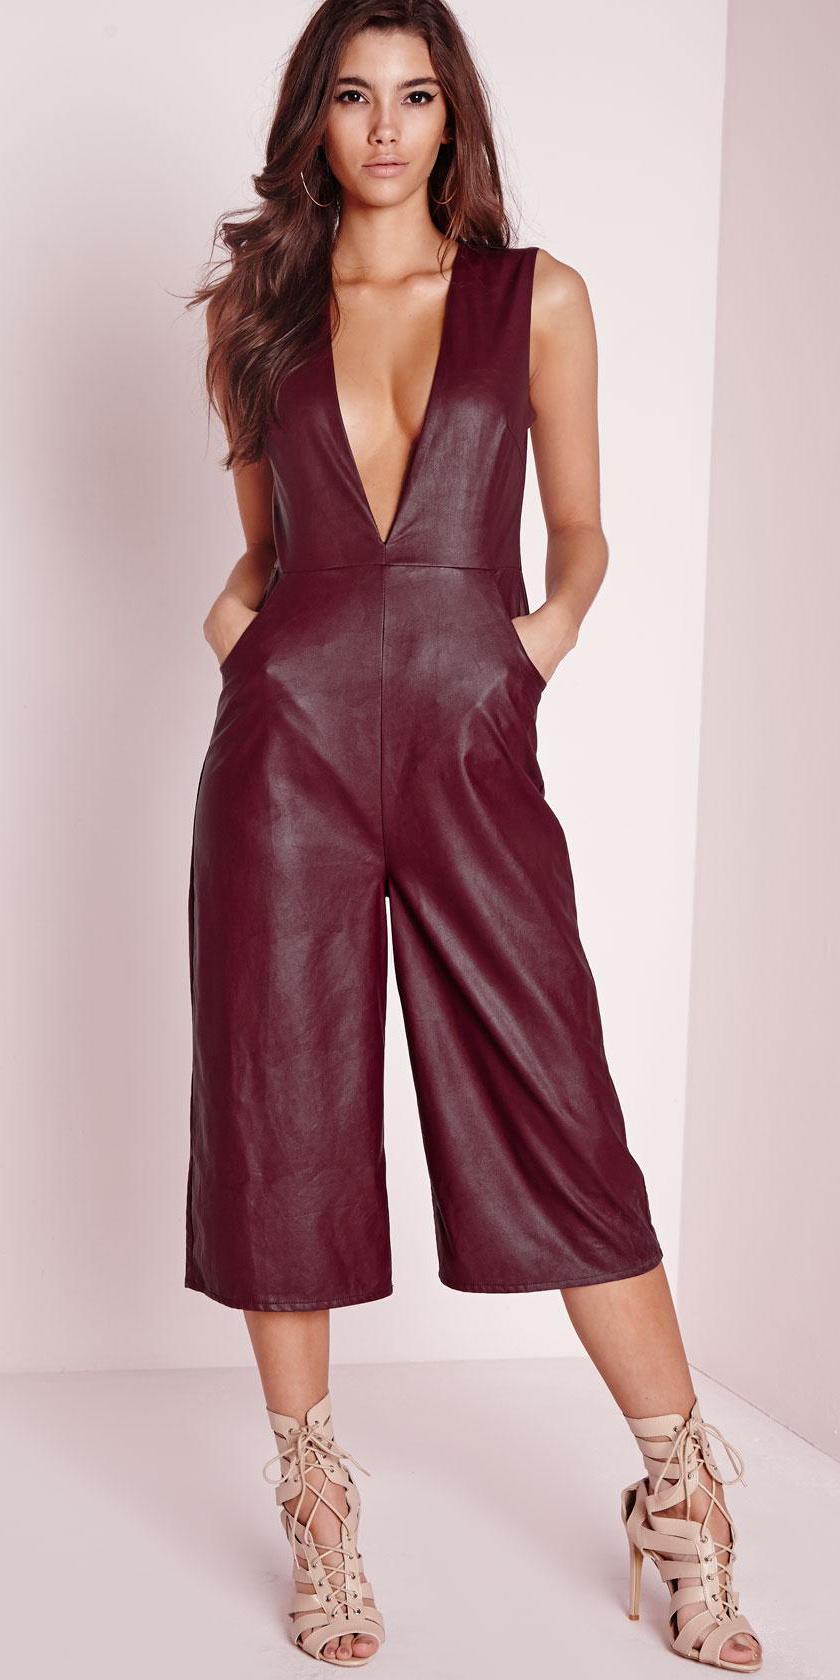 burgundy-jumpsuit-tan-shoe-sandalh-hoops-leather-howtowear-fall-winter-brun-dinner.jpg